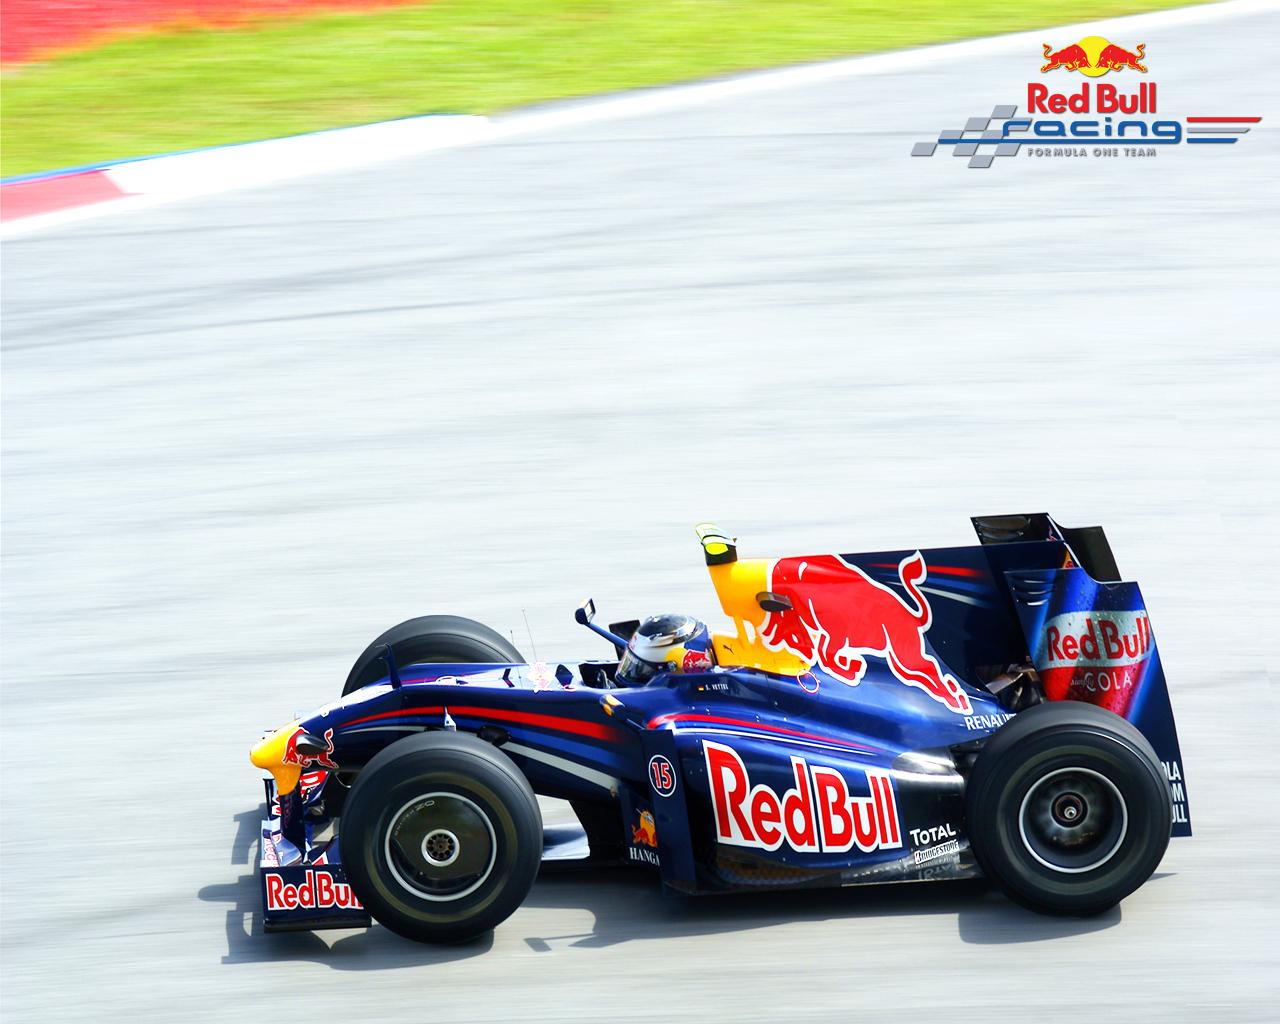 F1 Car Cartoon Red Bull Racing By P3p70 On Deviantart